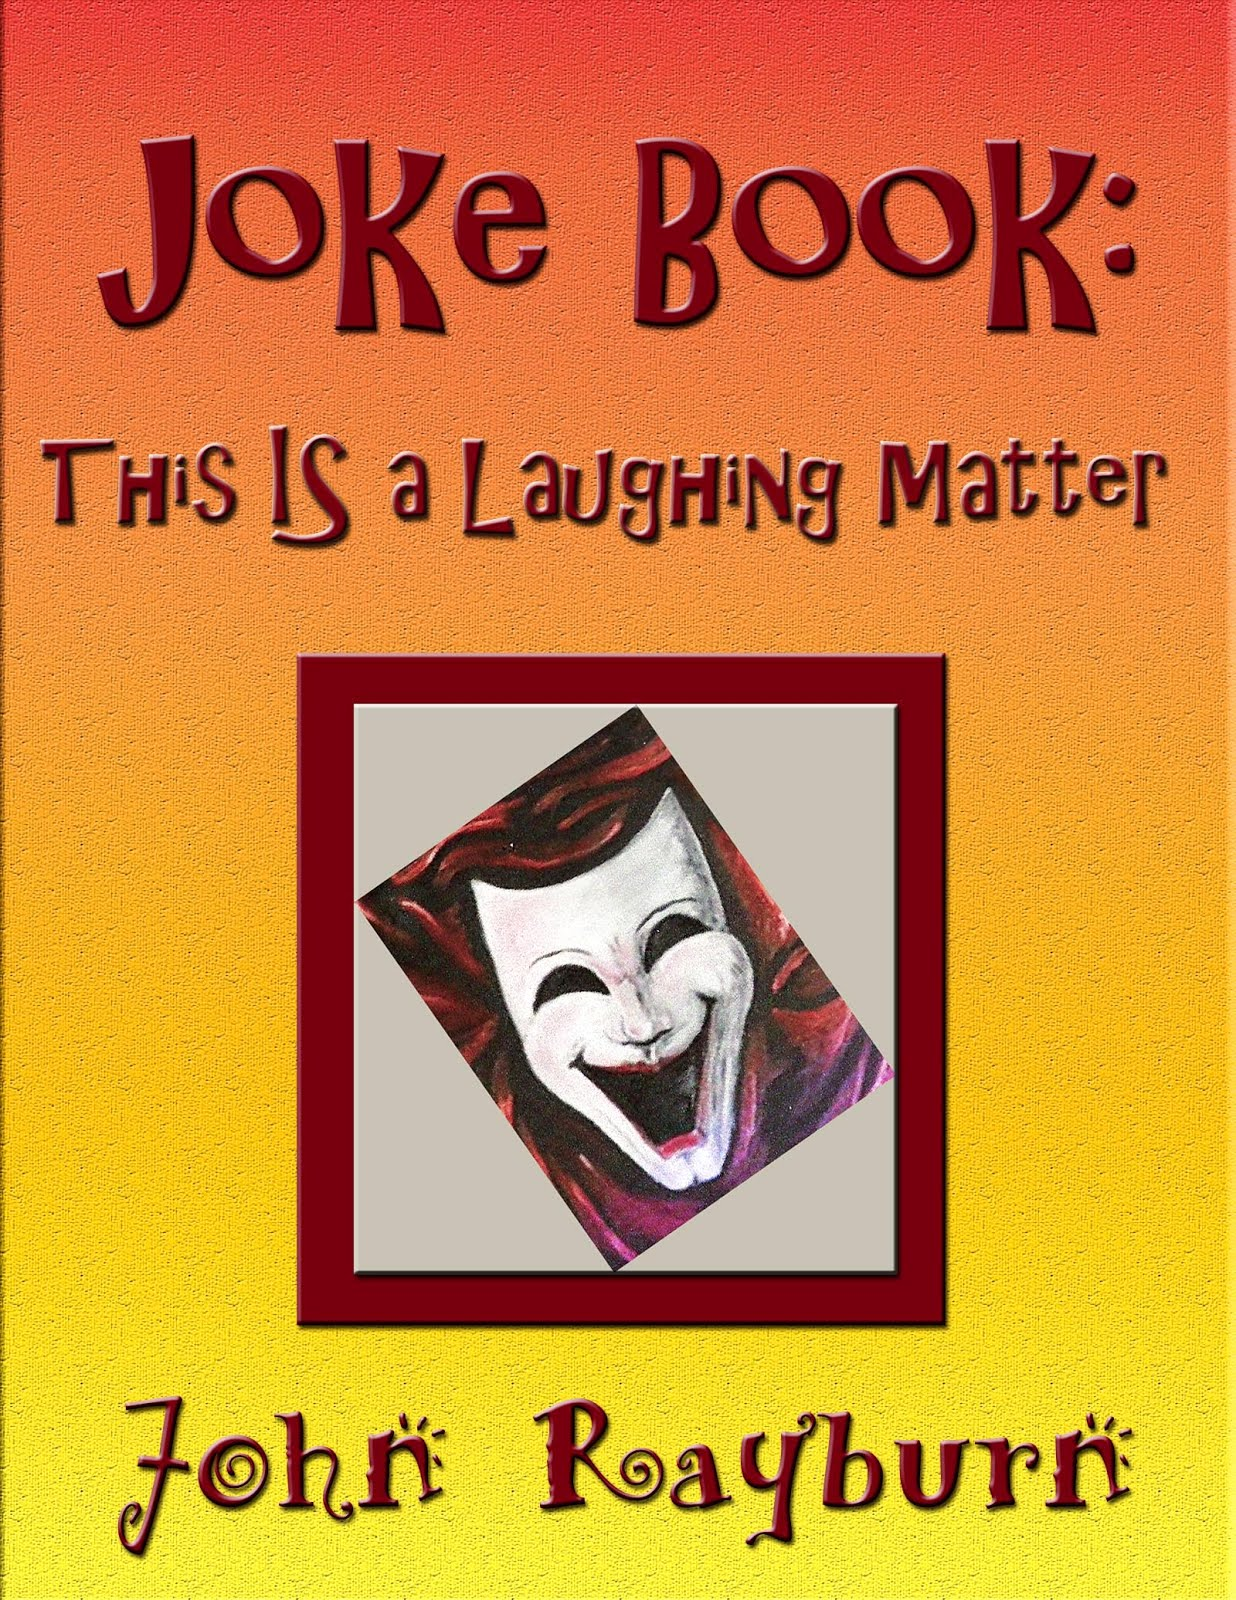 Joke Book: It IS a Laughing Matter